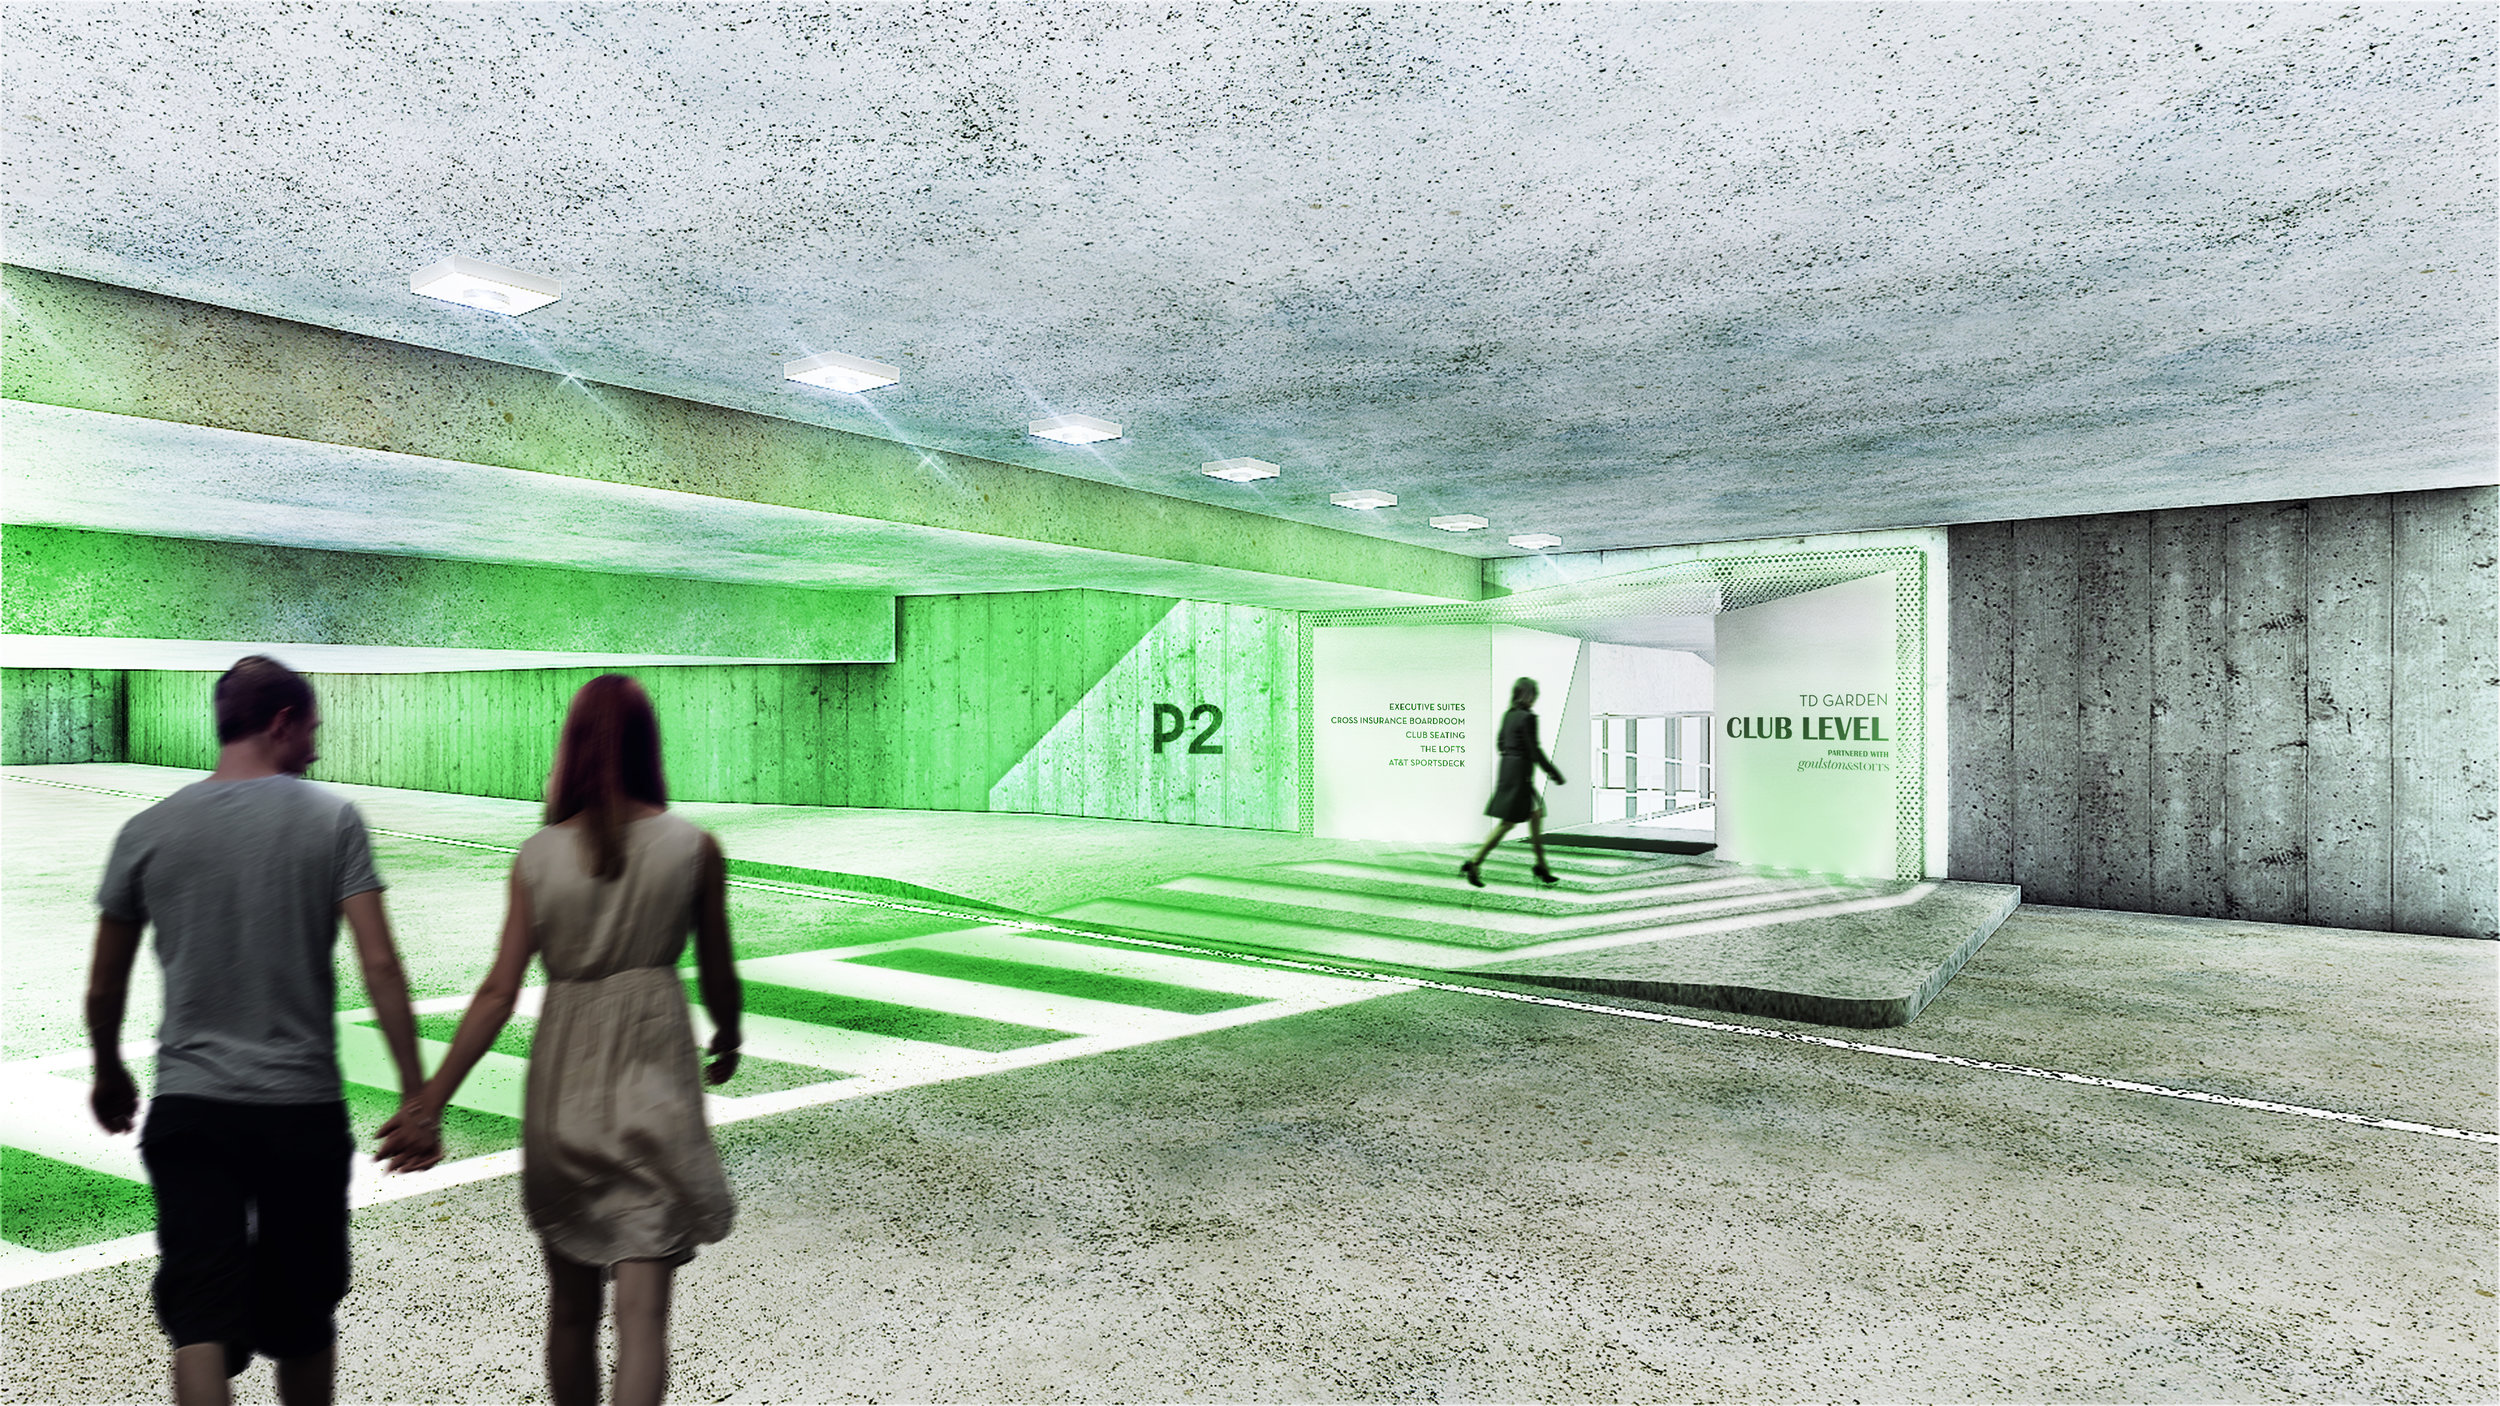 P2_Entrance_03_Celtics.jpg